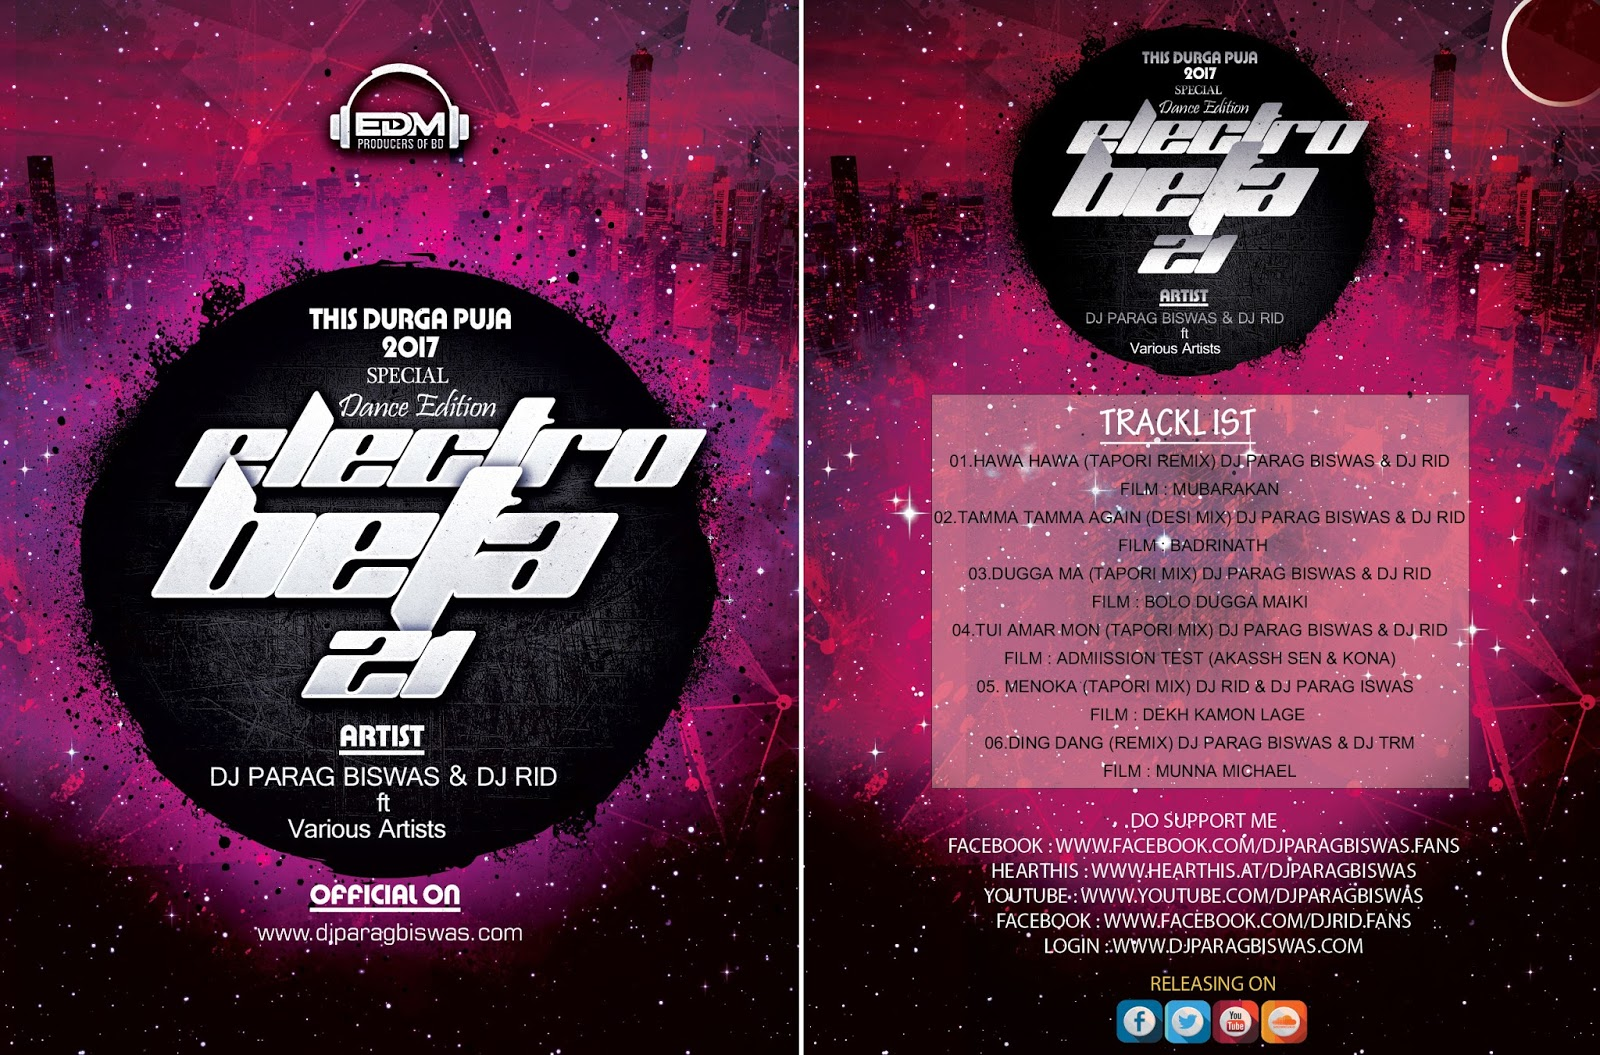 Electro Beat 21 (Durga Puja Special Dance Edition Album) DJ Parag